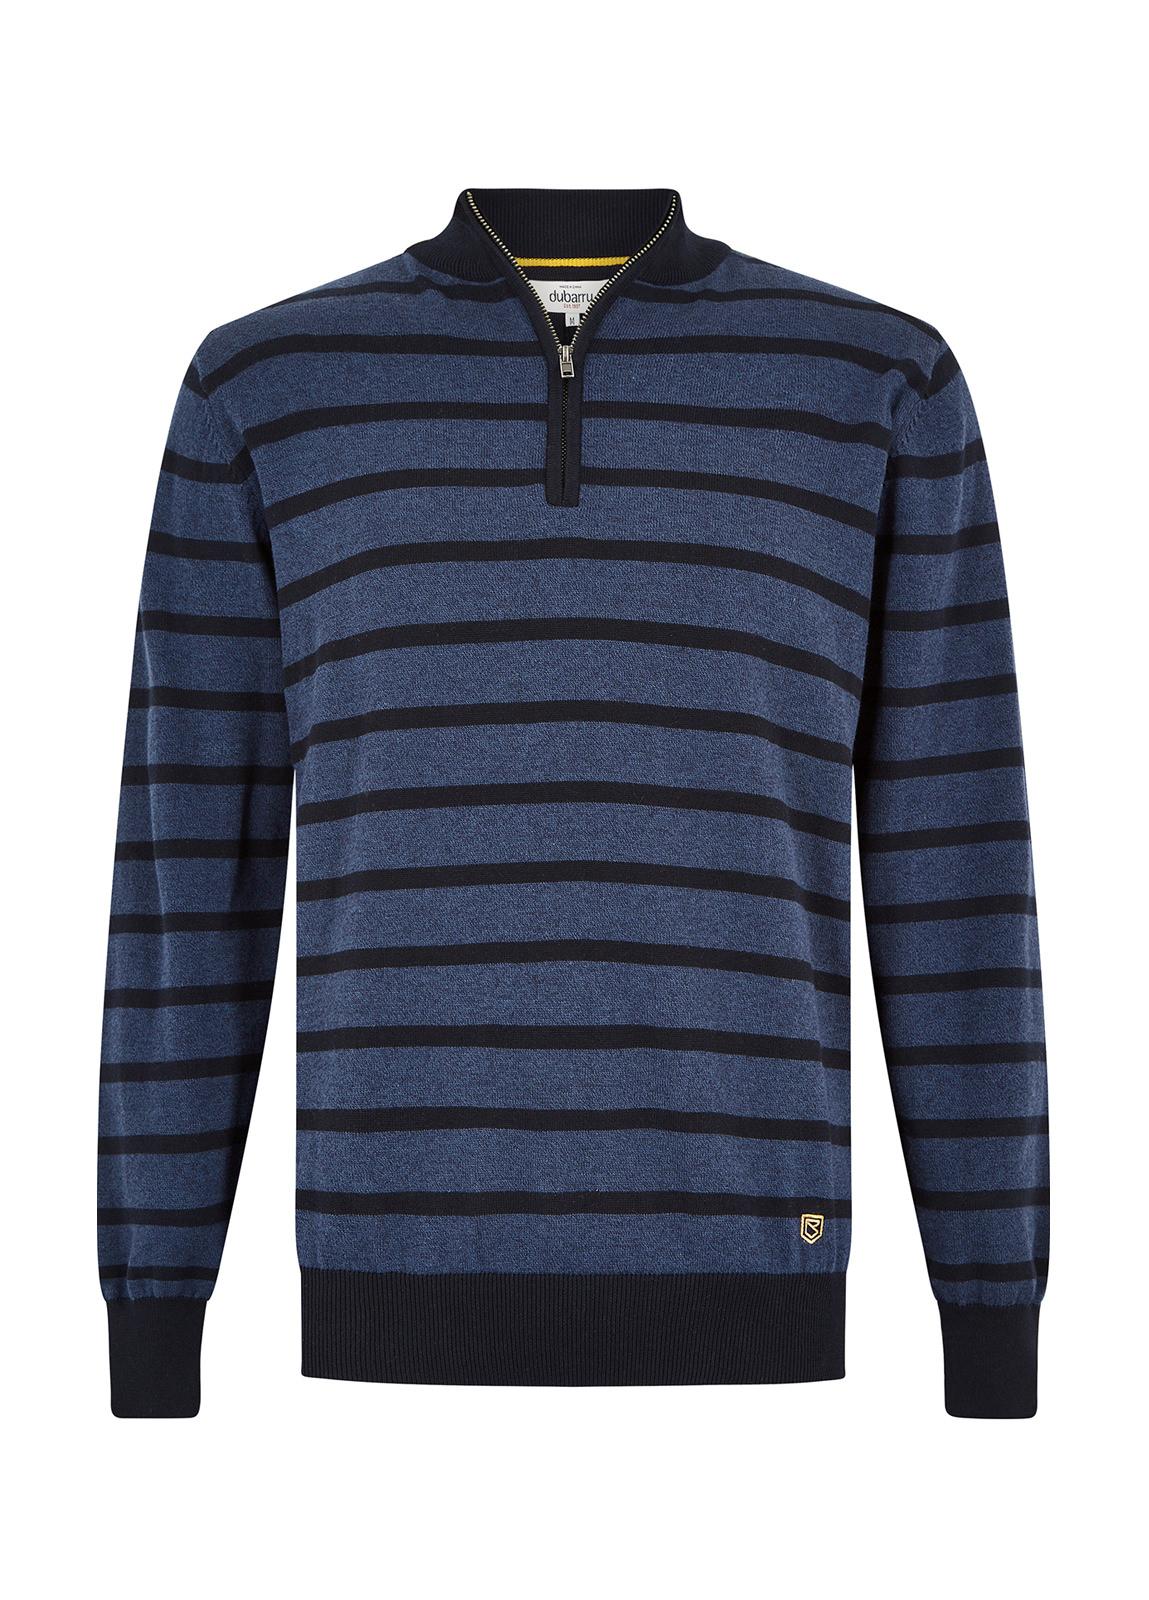 Dubarry_Abbeyville Sweater - Navy/Bordo_Image_2